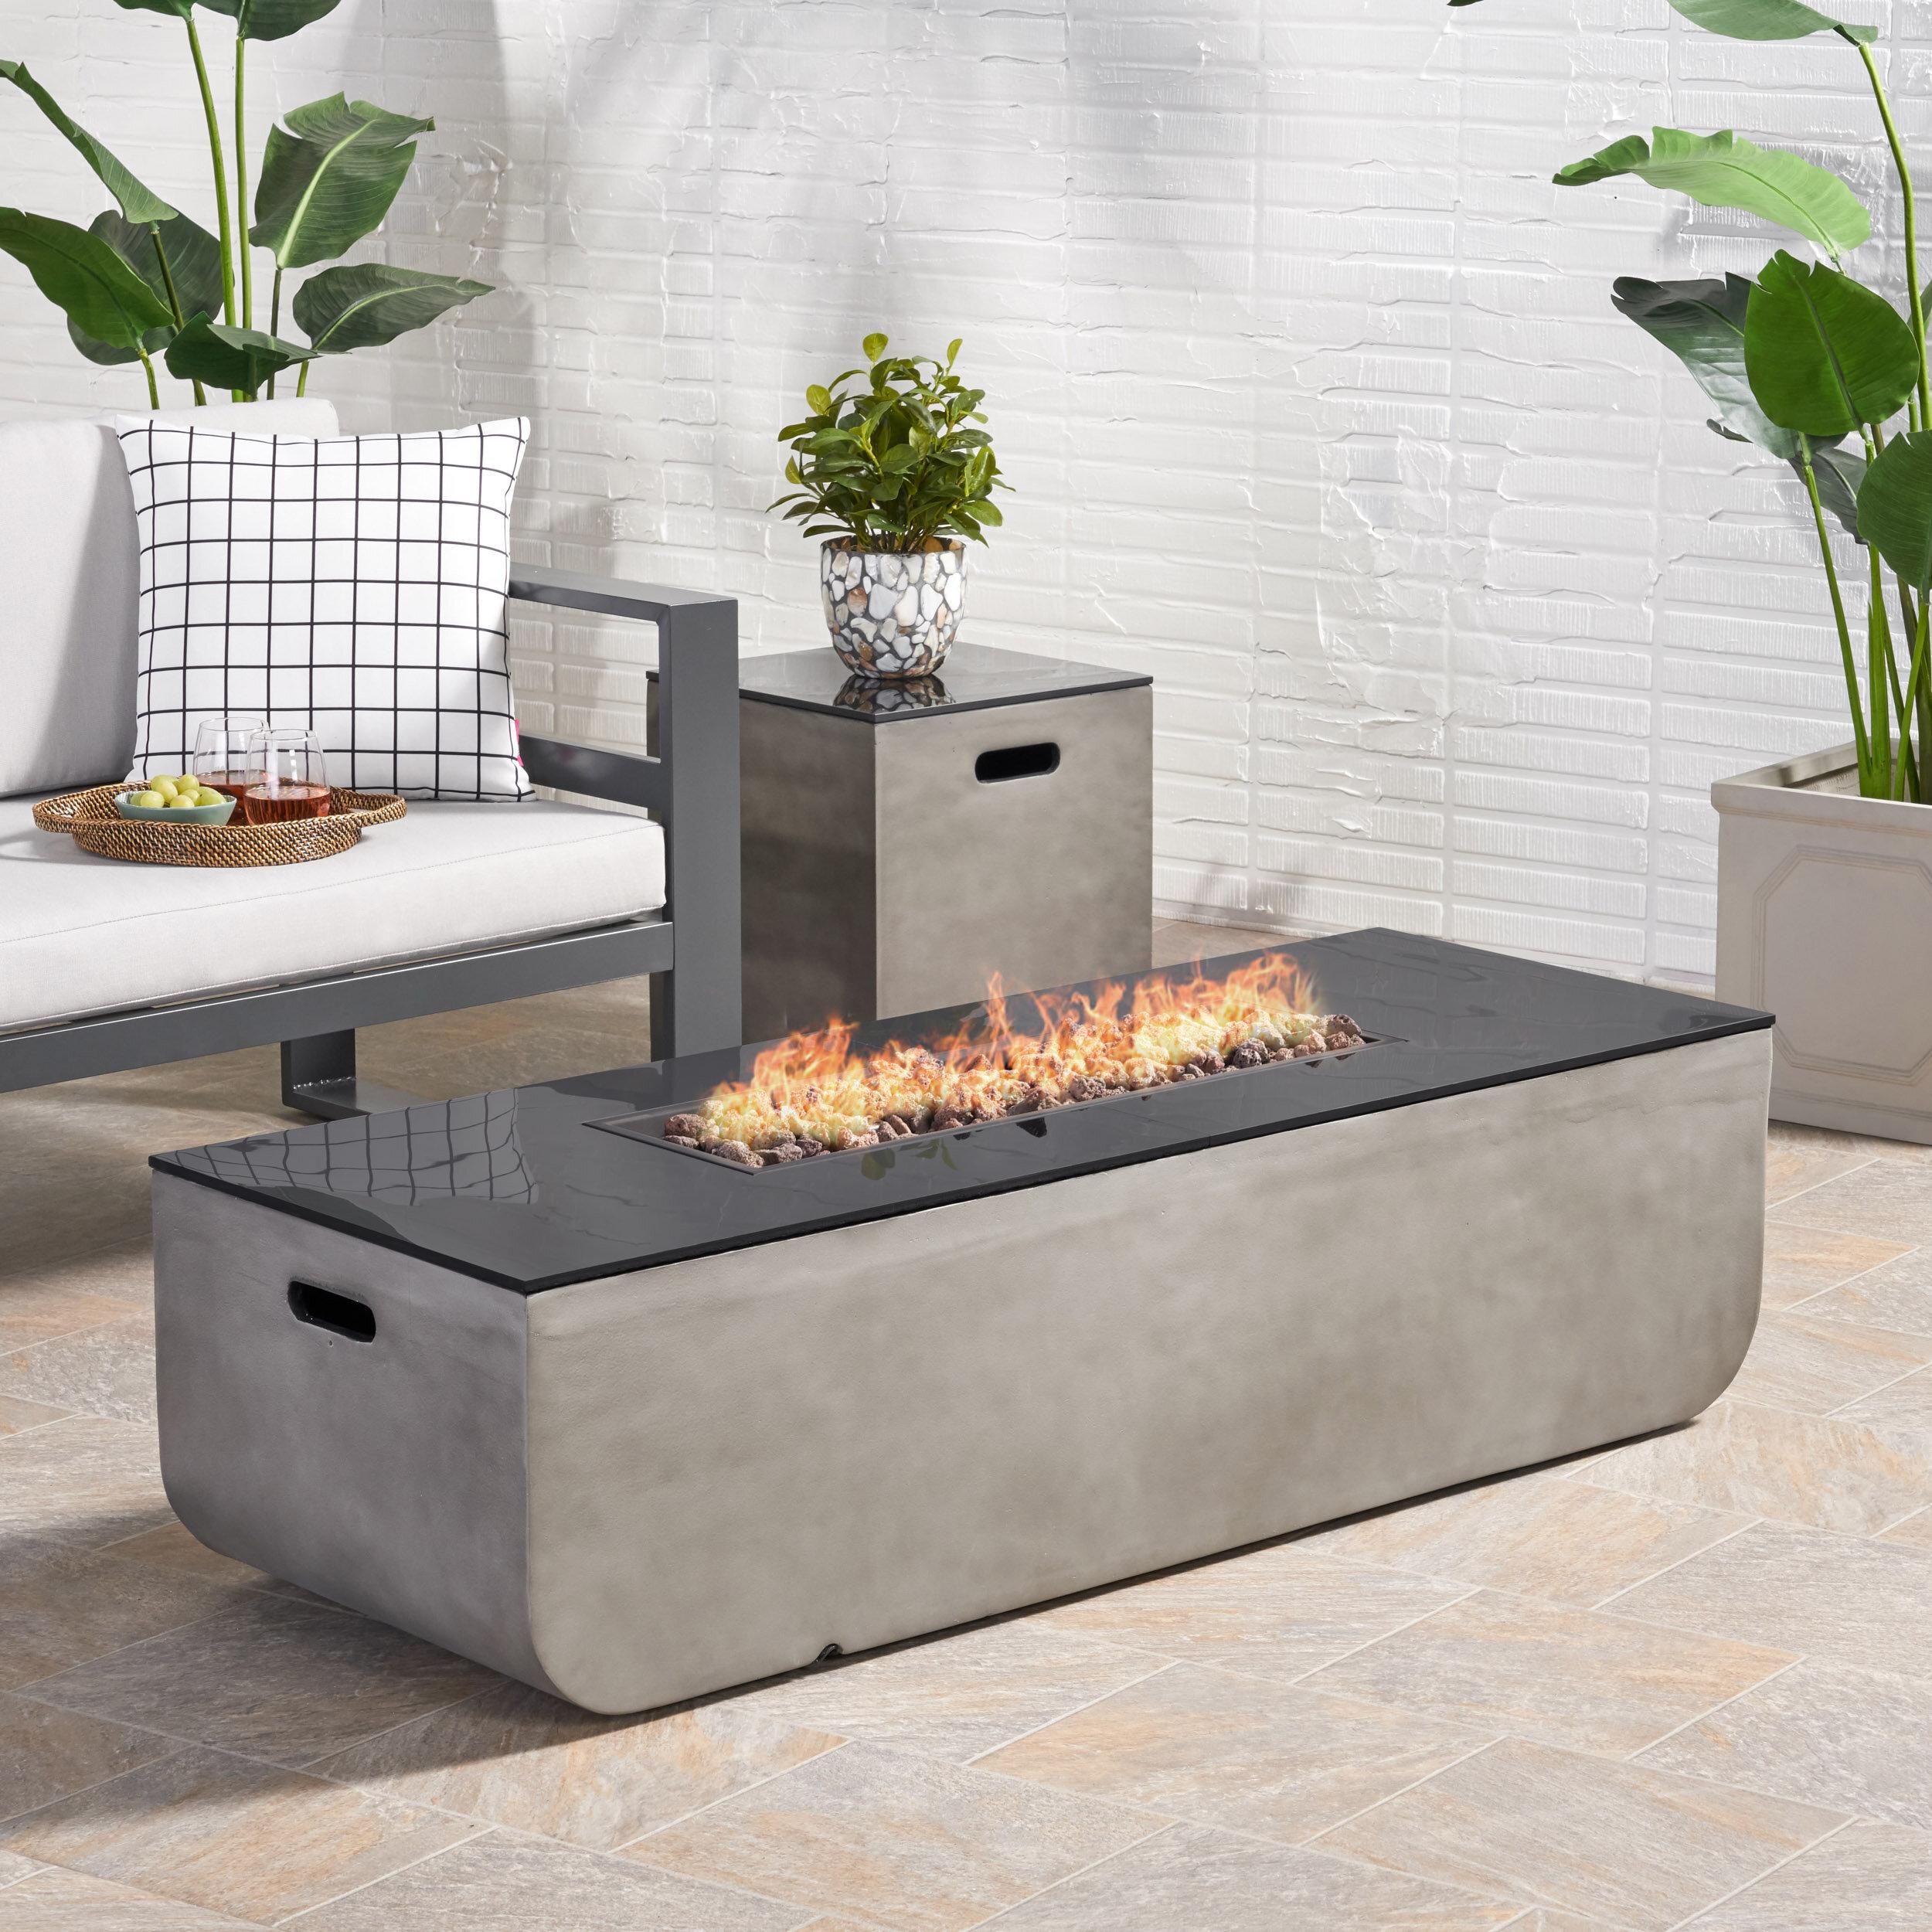 Ebern Designs Luvana Outdoor With Tank Holder Concrete Propane Fire Pit Reviews Wayfair